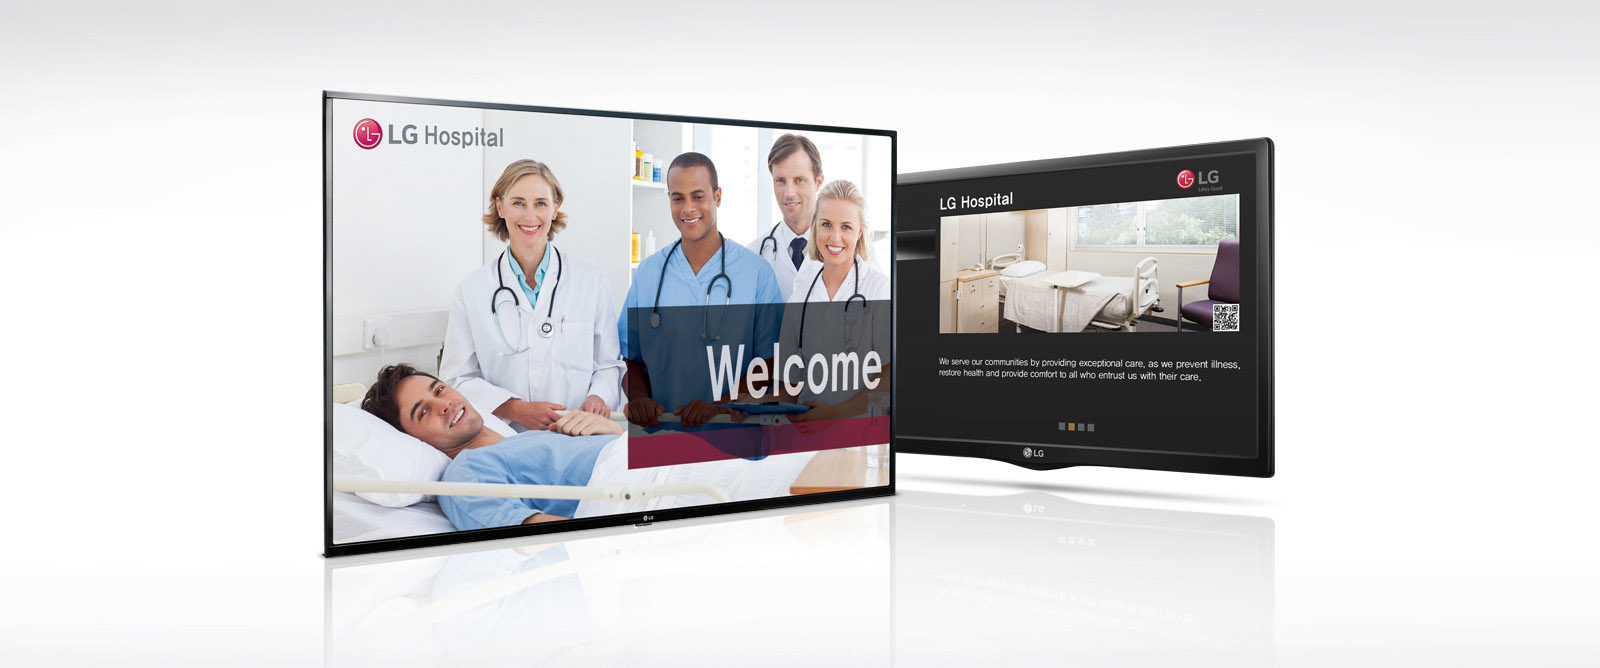 LG TV Commercial Healthcare Equipment Hospital TV